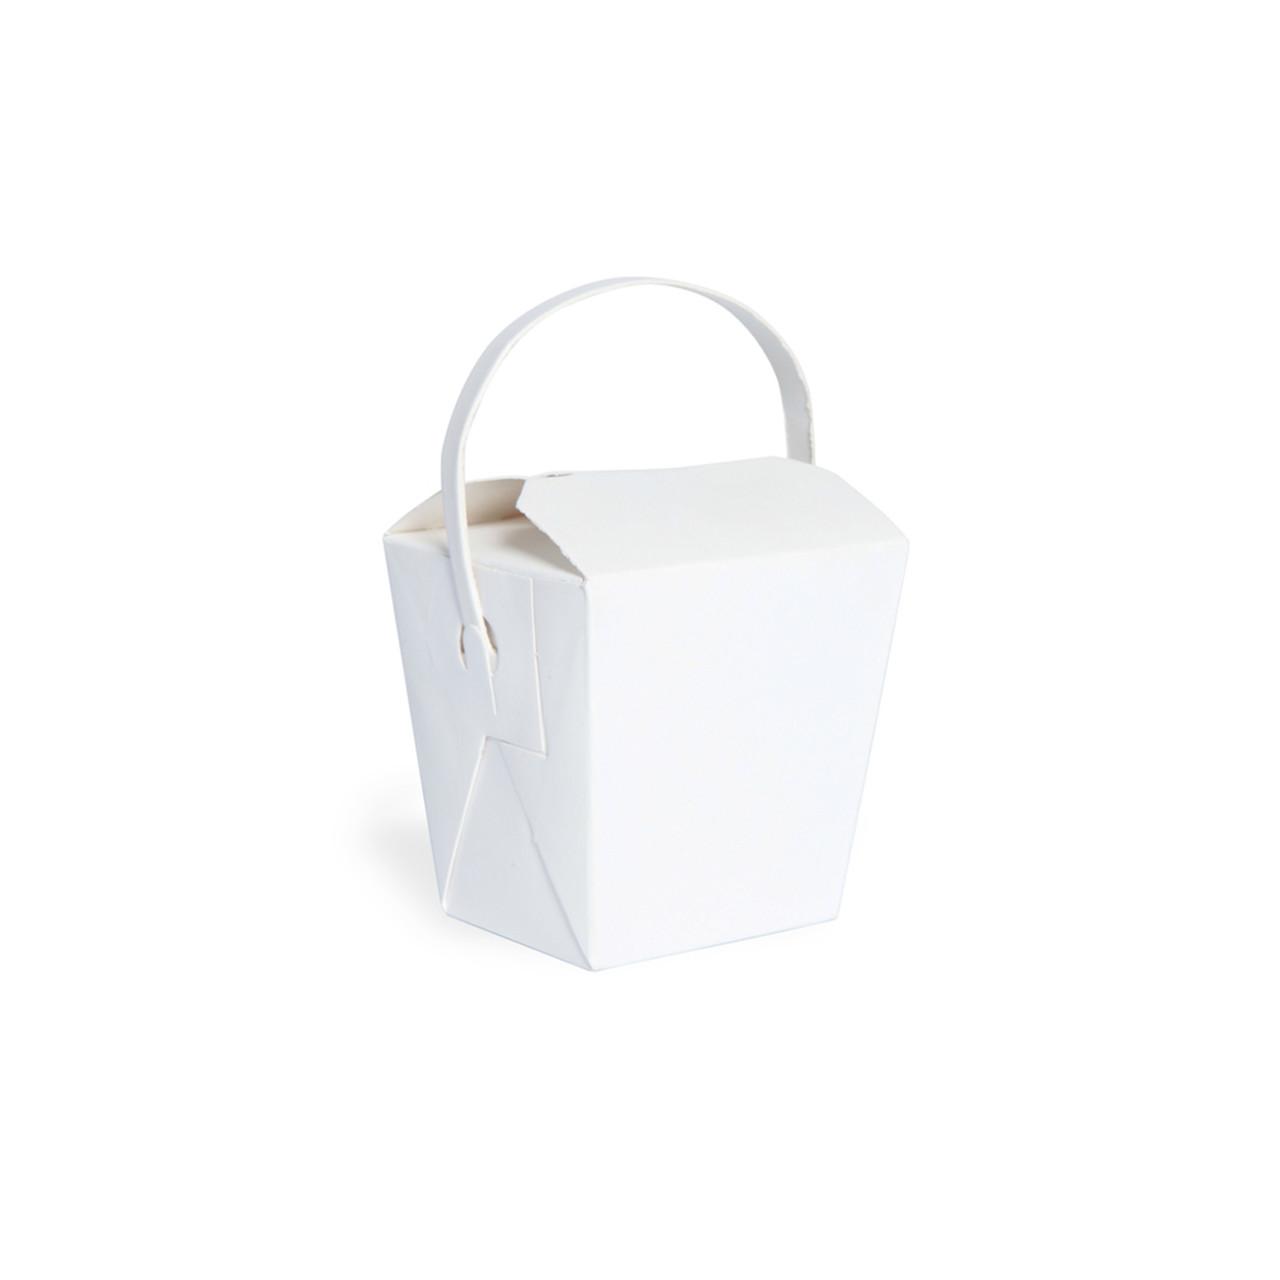 Mini White Take Out Box With Handle -8oz L:1.8 x W:2.2 x H:2.8 in.